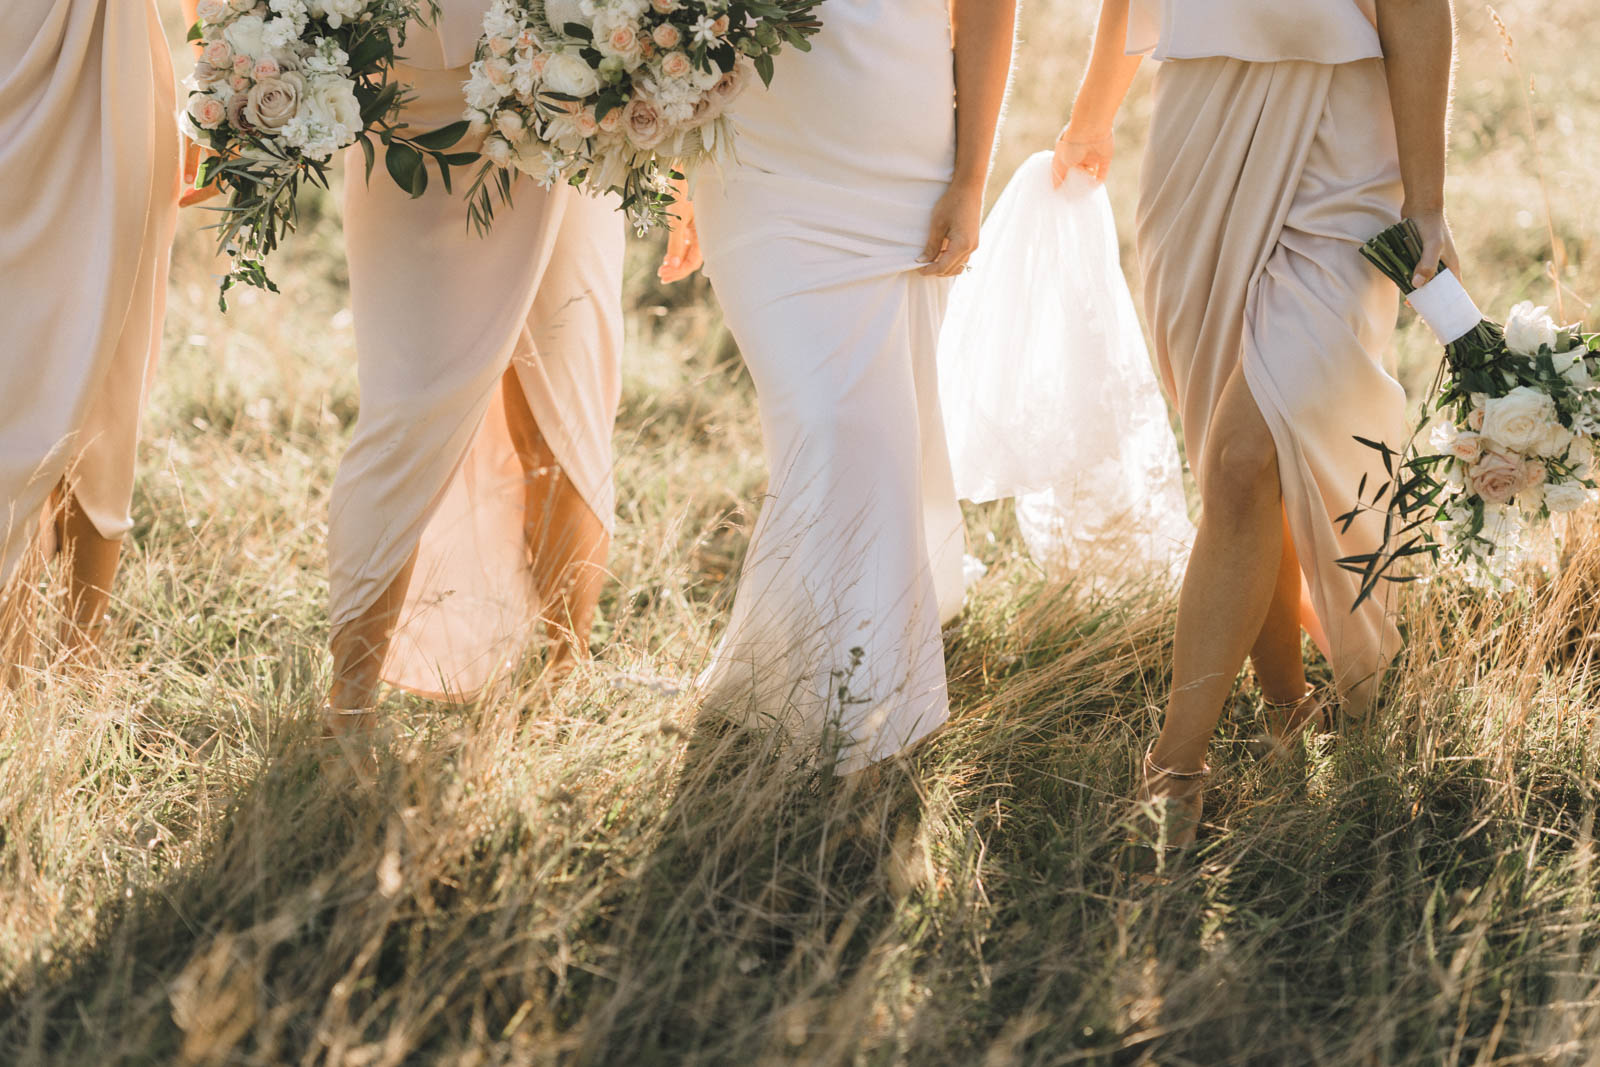 newfound-k-s-hilton-taupo-wedding-photographer-051